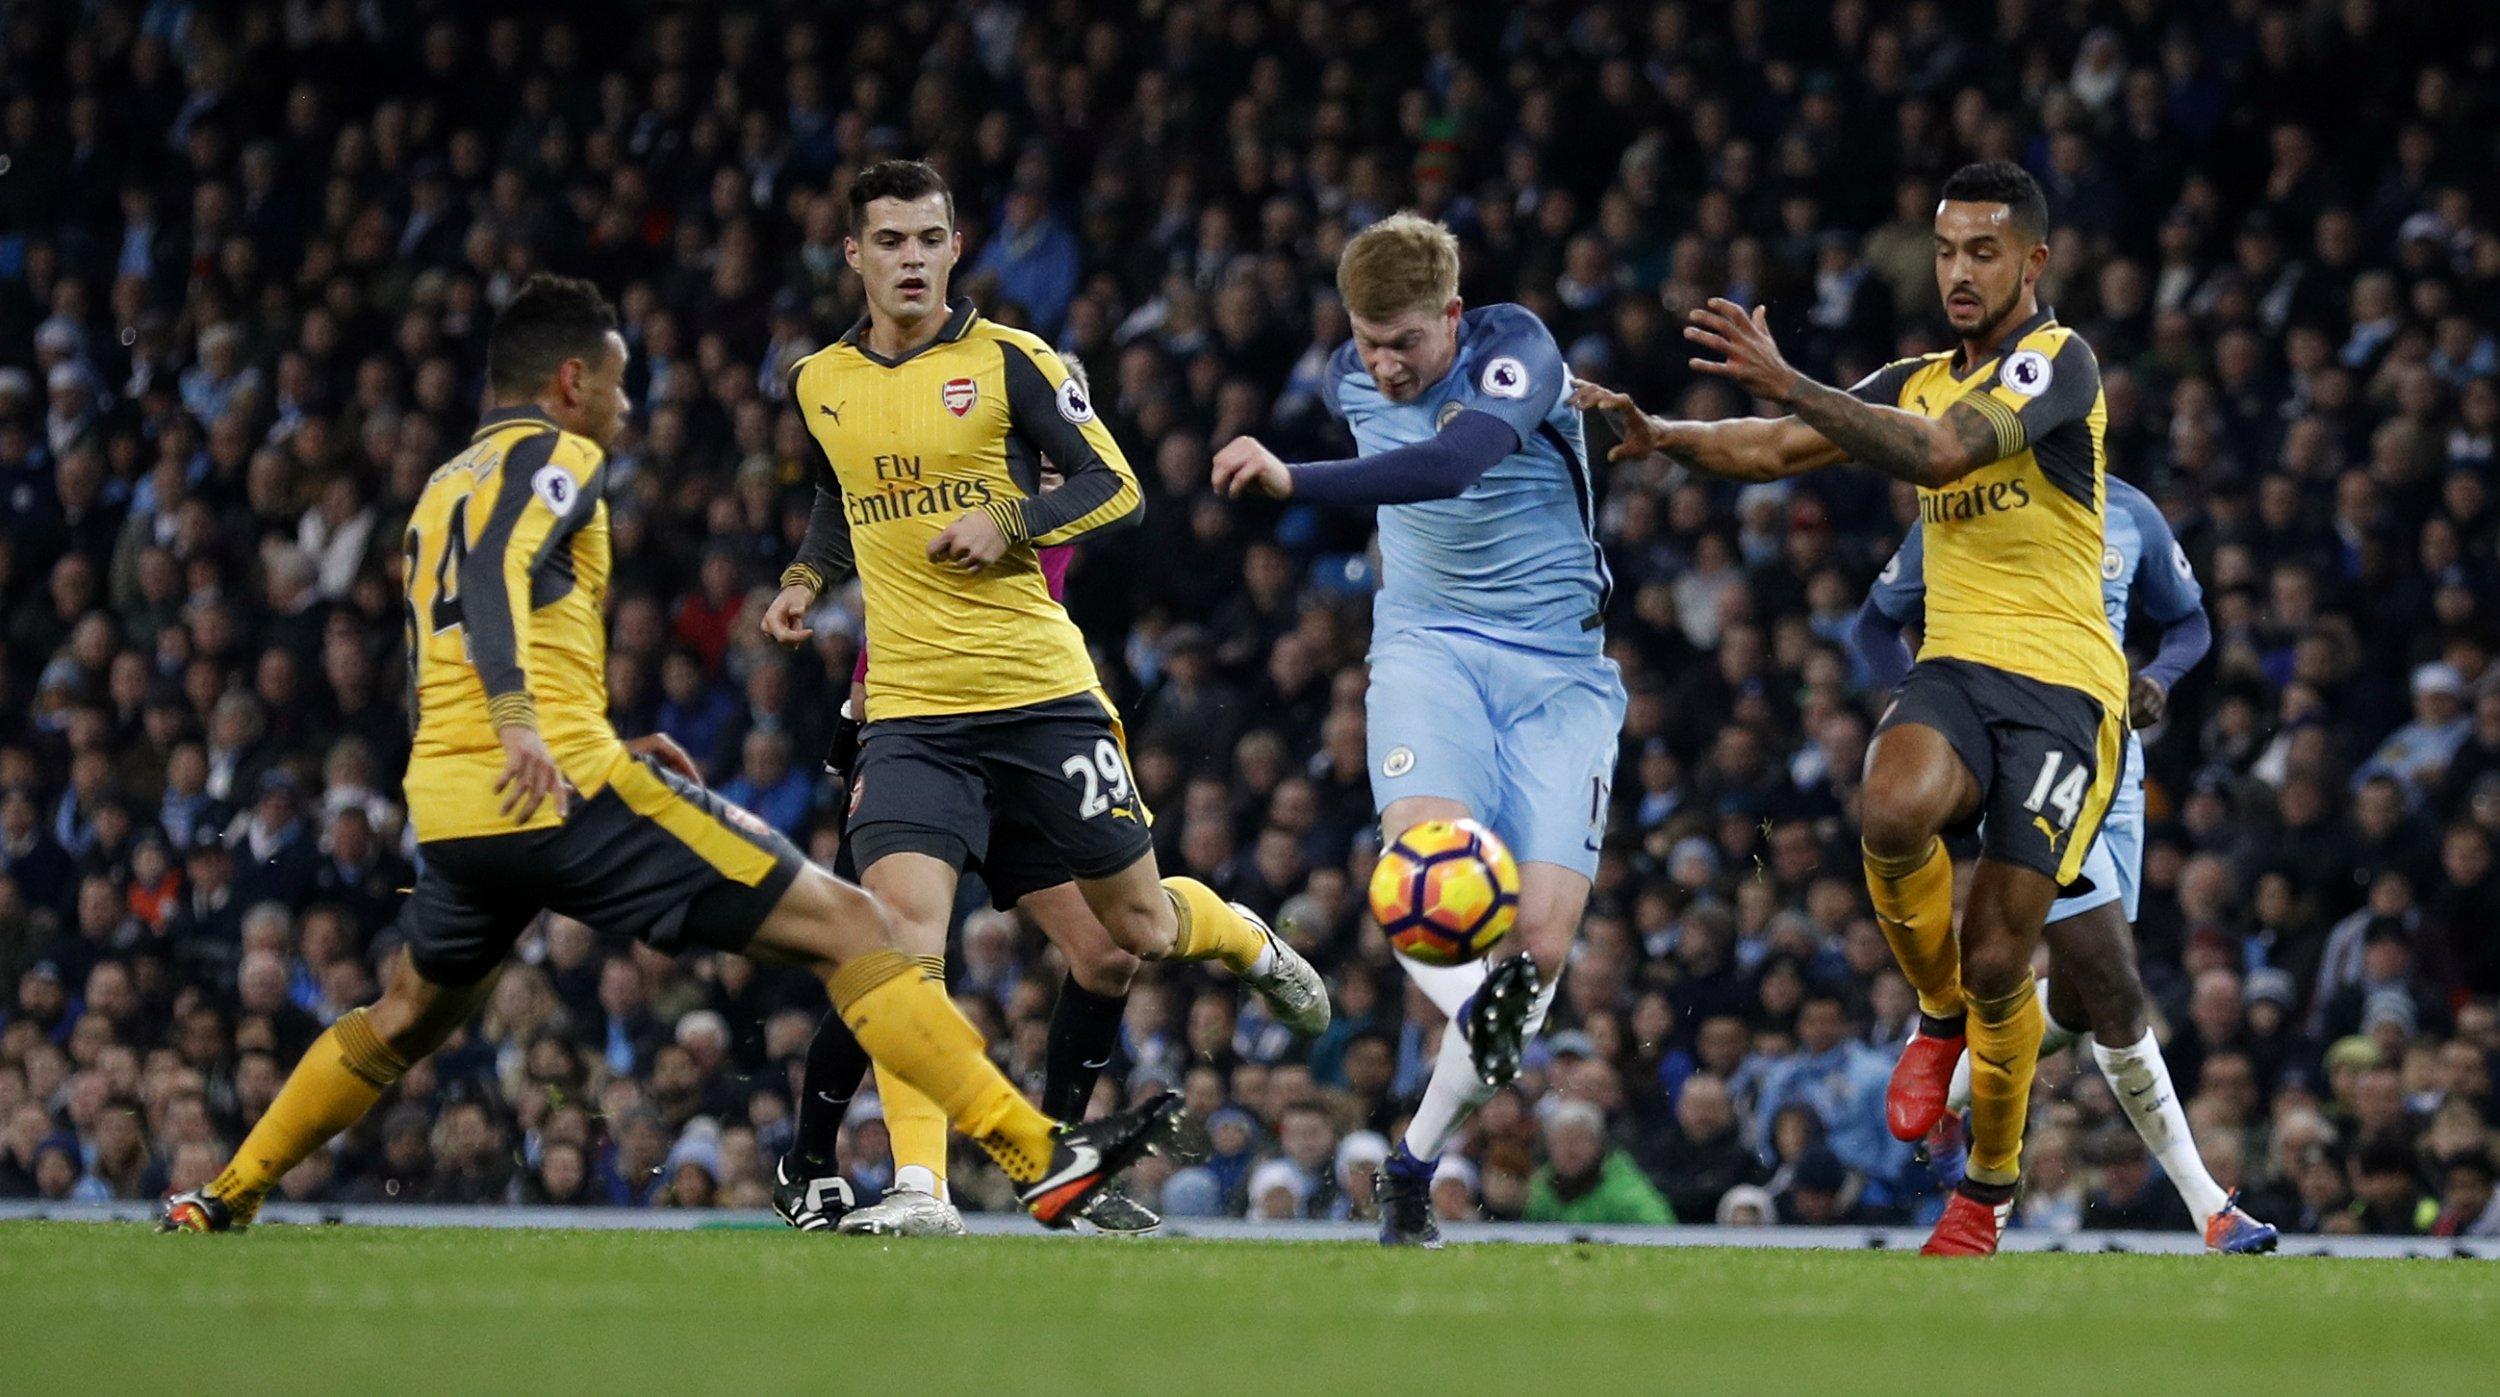 City vs Arsenal